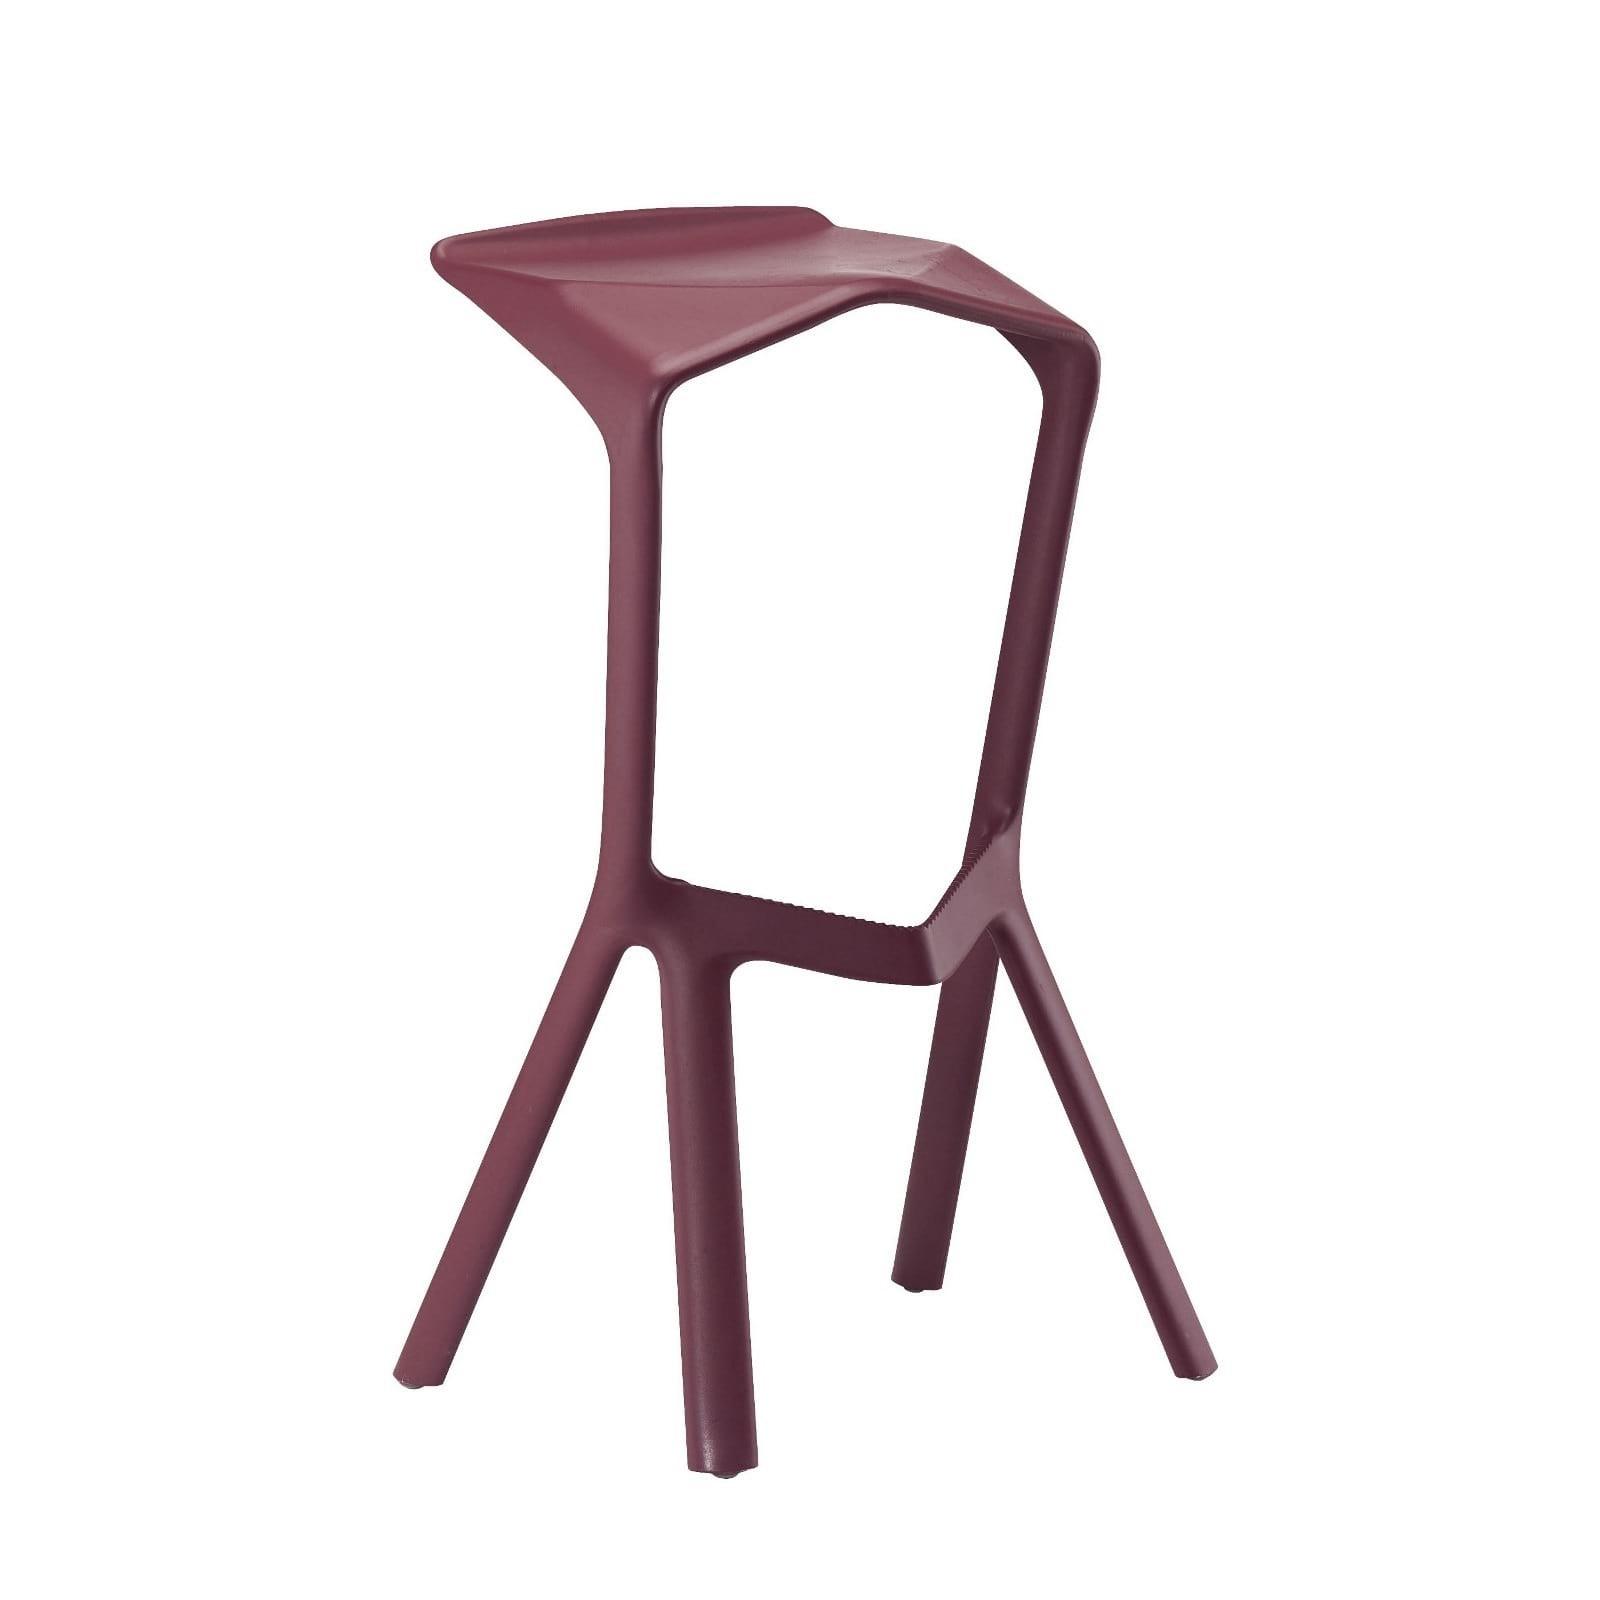 MIURA Bar Stool (Wine Red) - Plank